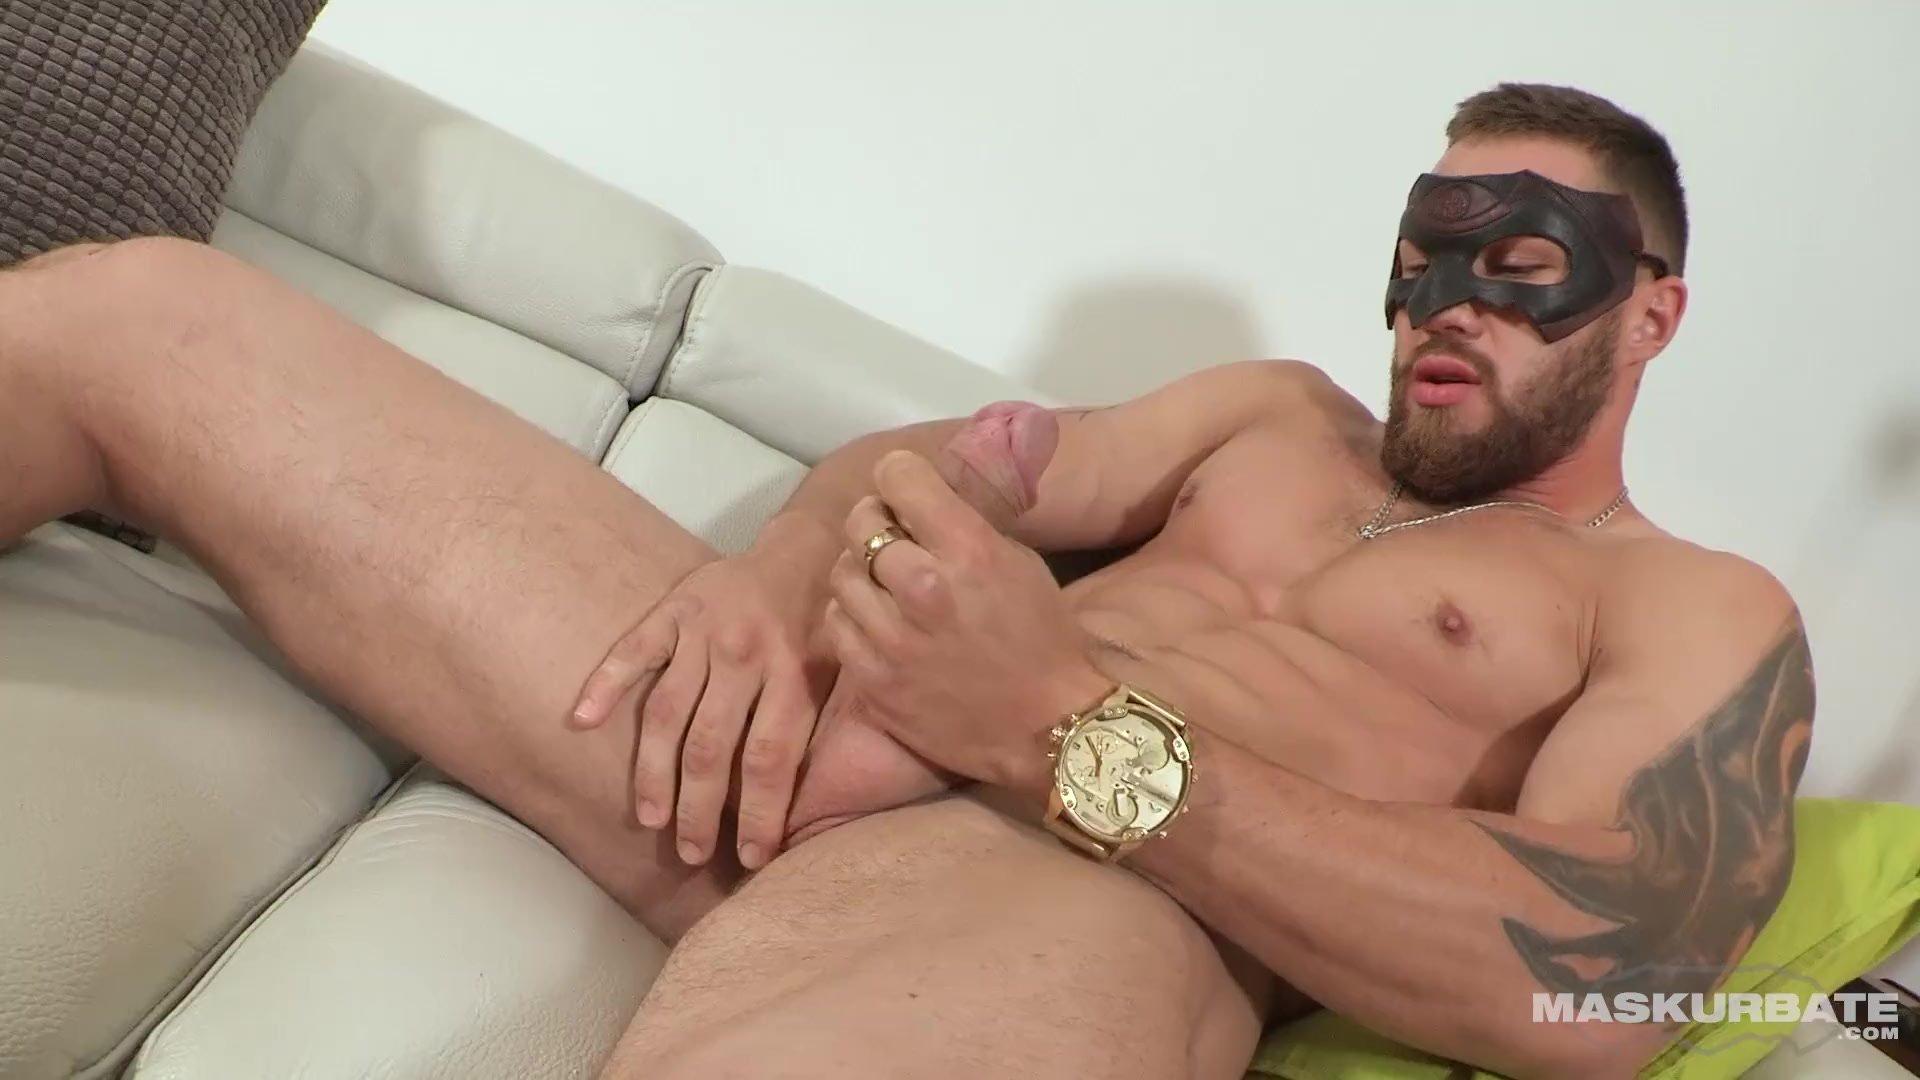 Maskurbate French Canadian Boy Jerking Big Uncut Dick